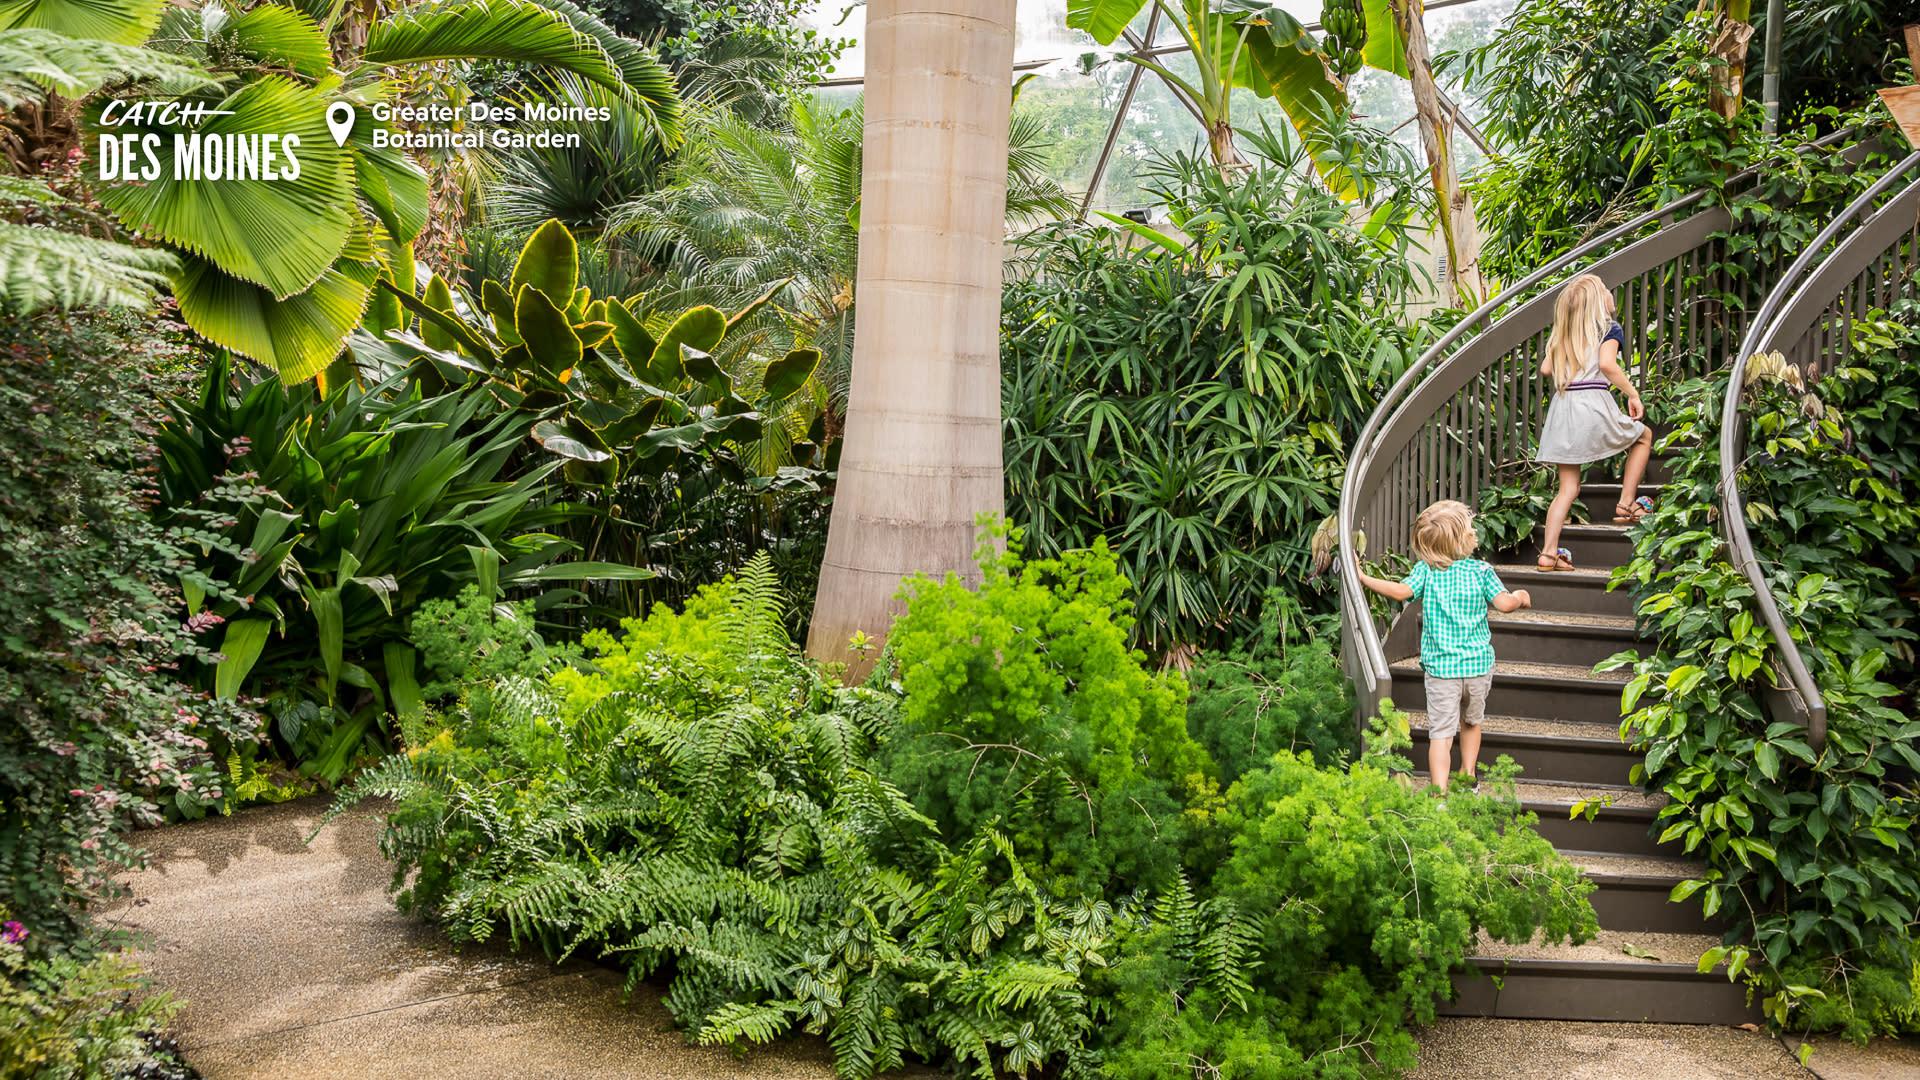 Greater Des Moines Botanical Garden Interior Zoom Background